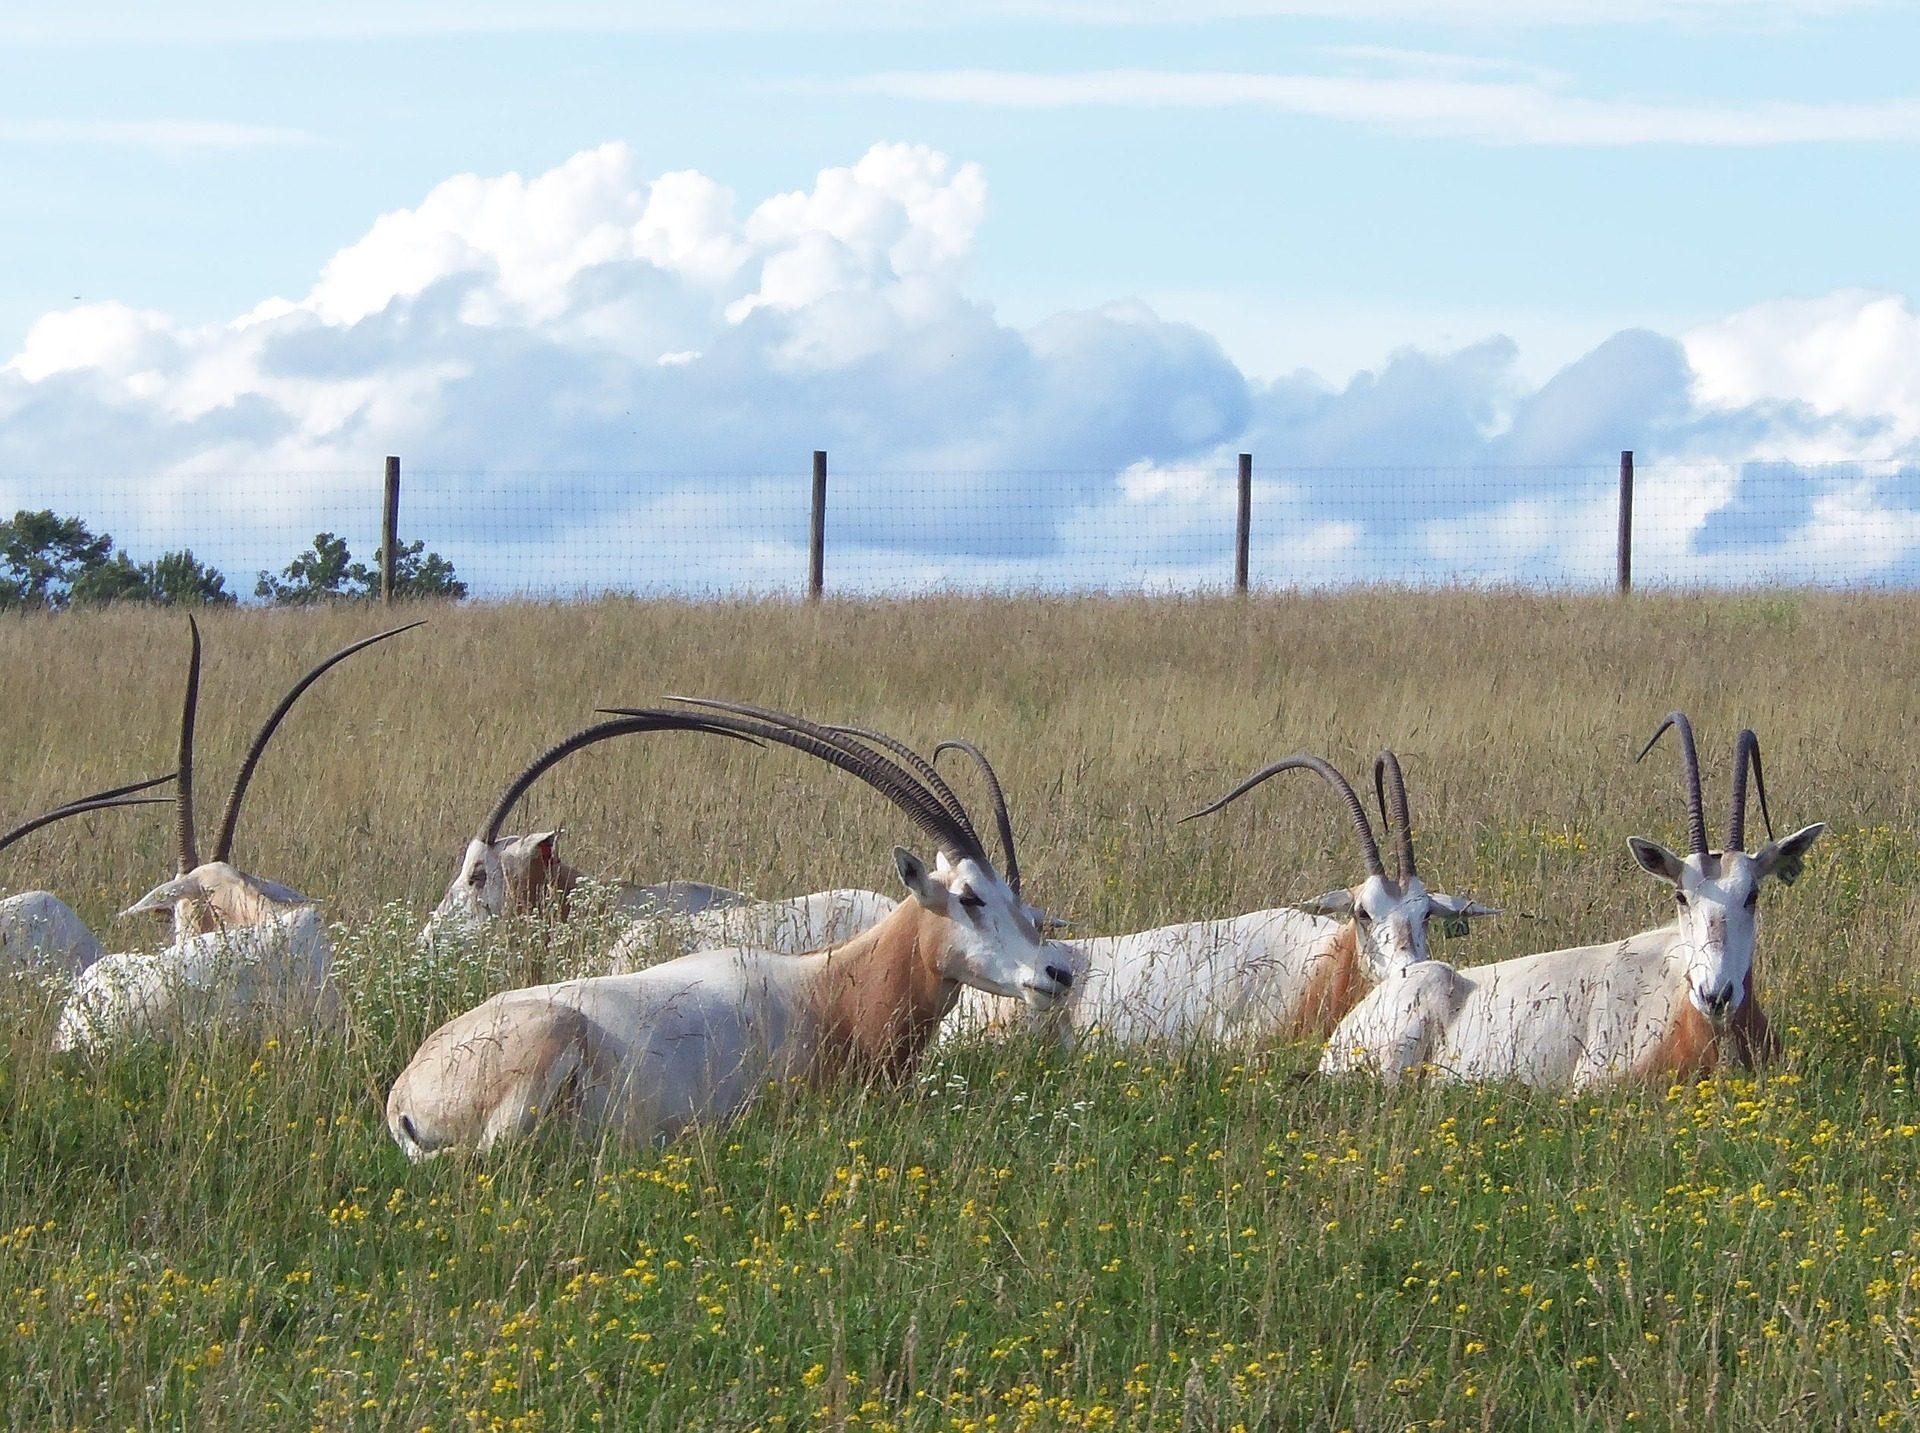 oryx, 牛群, 喇叭, antílopes, 野生动物园 - 高清壁纸 - 教授-falken.com